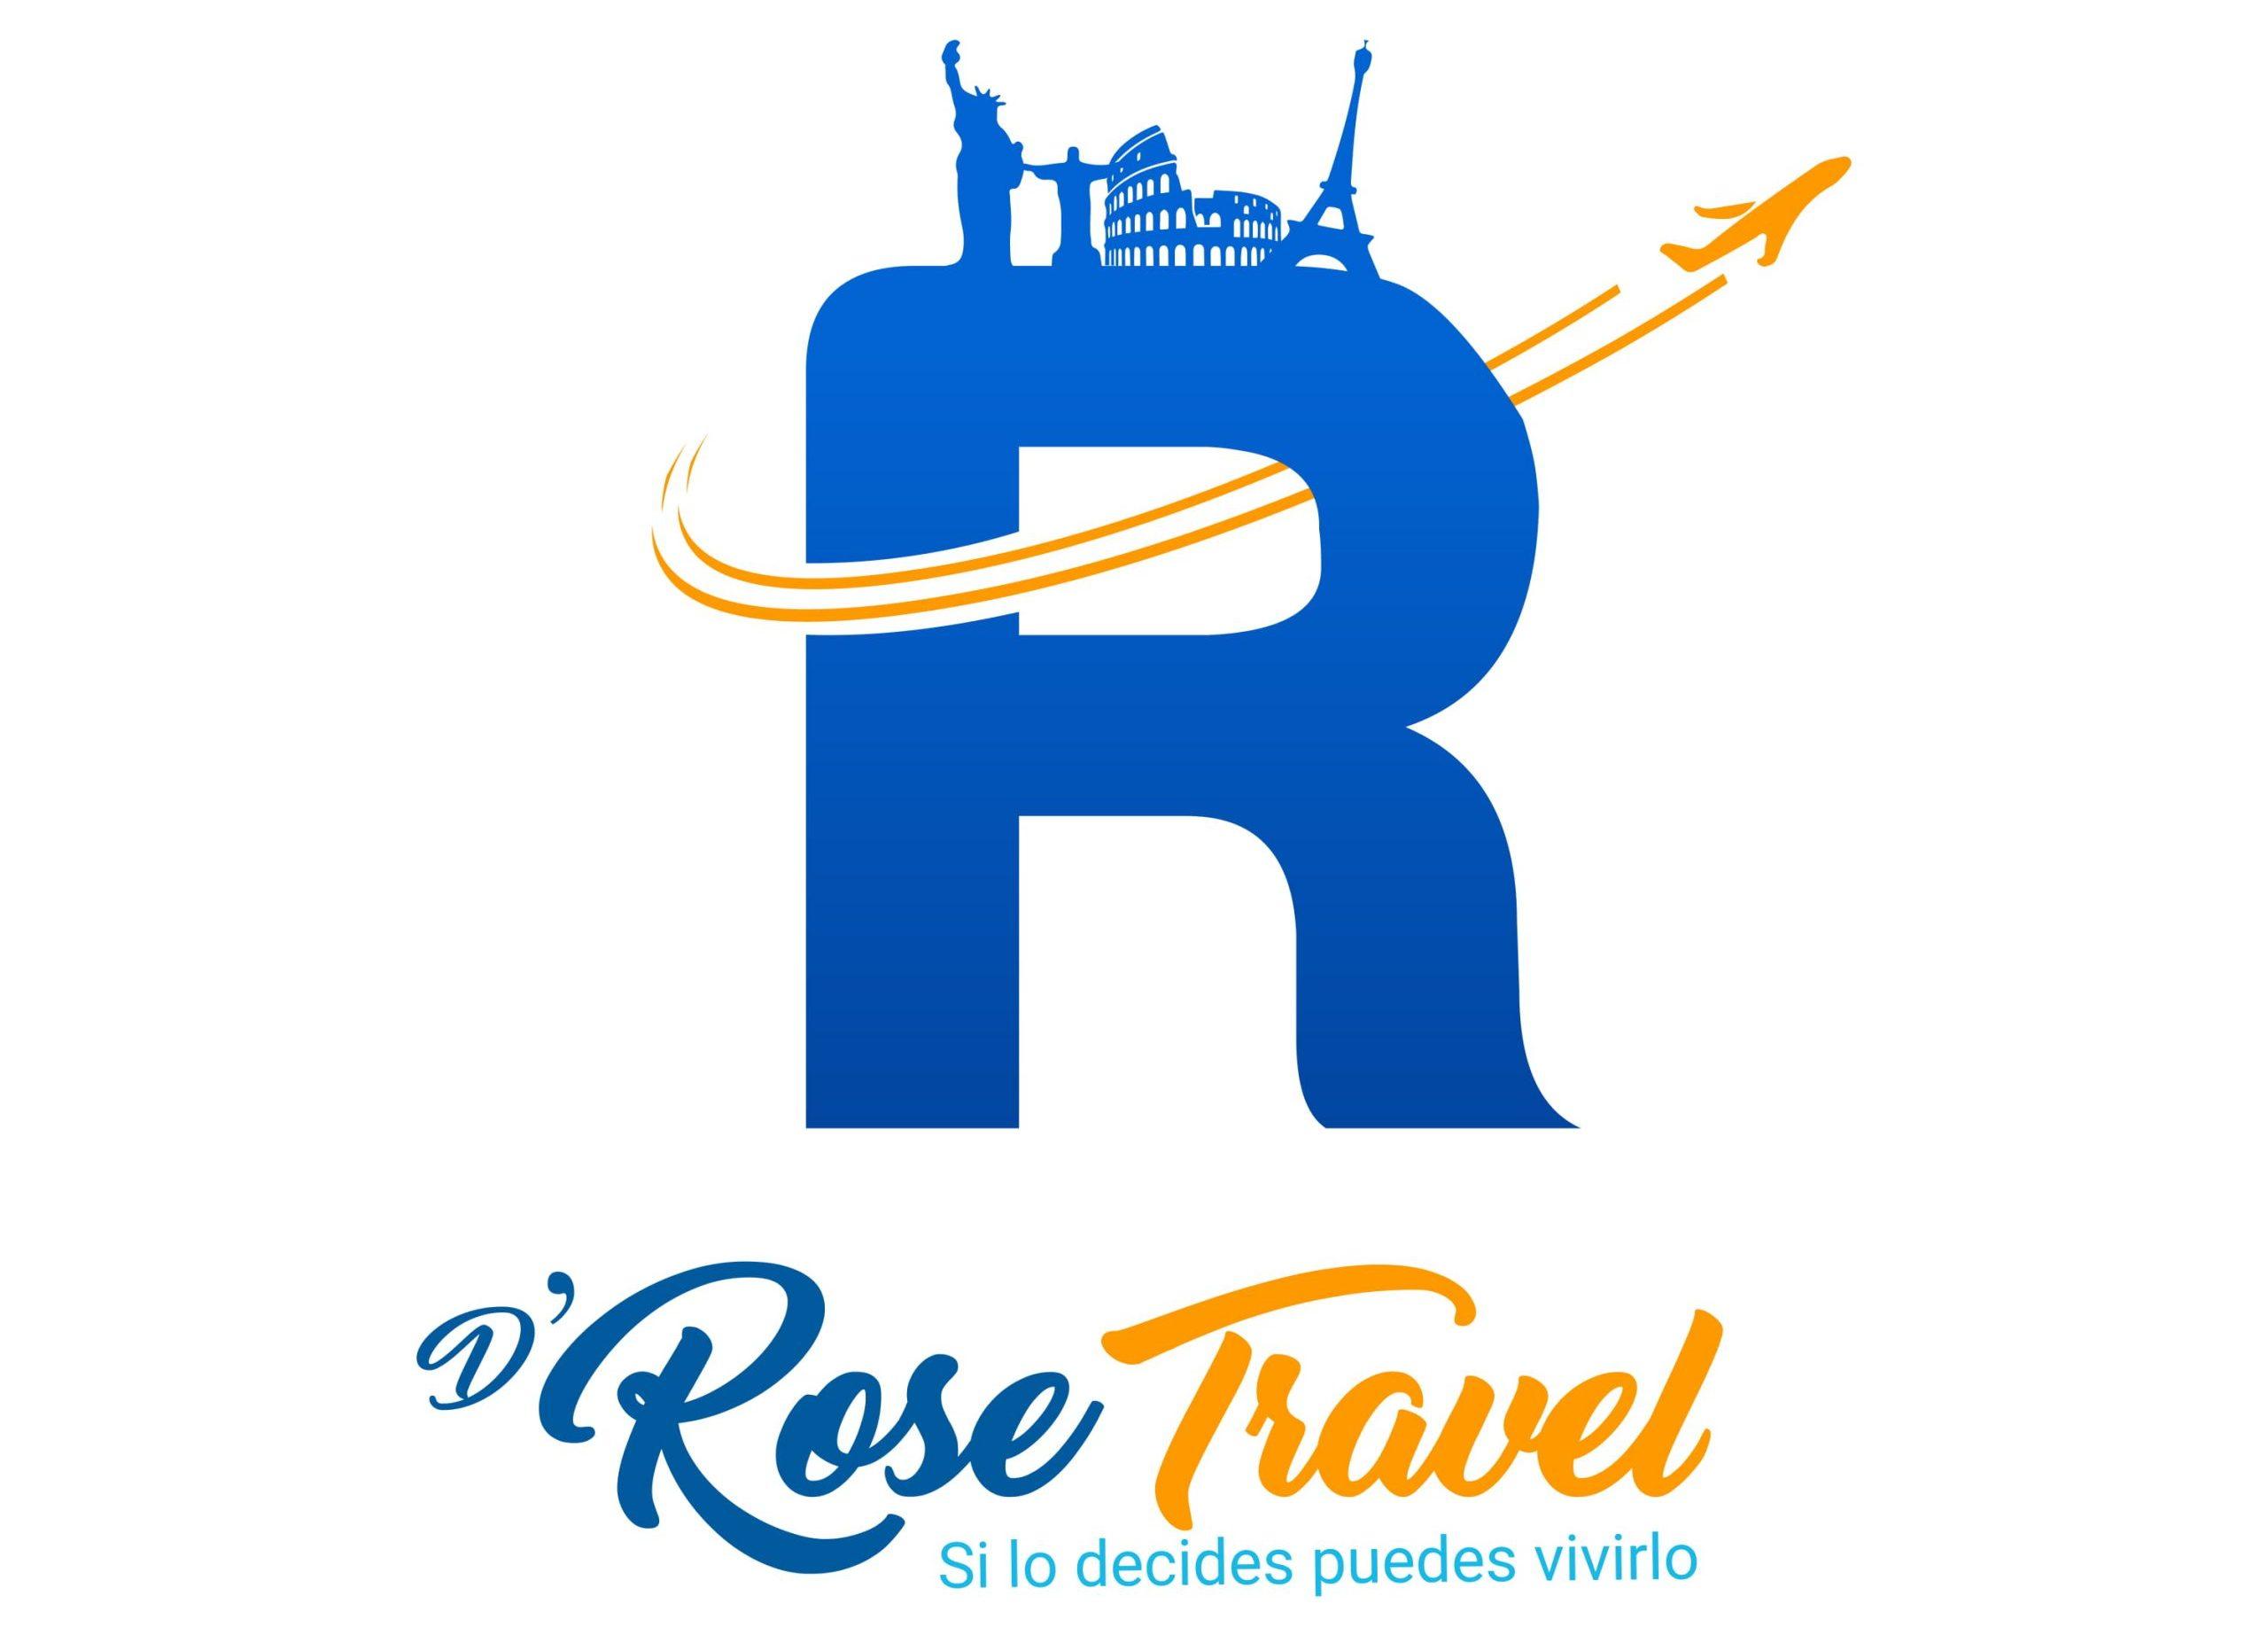 D' ROSE TRAVEL & SERVICES